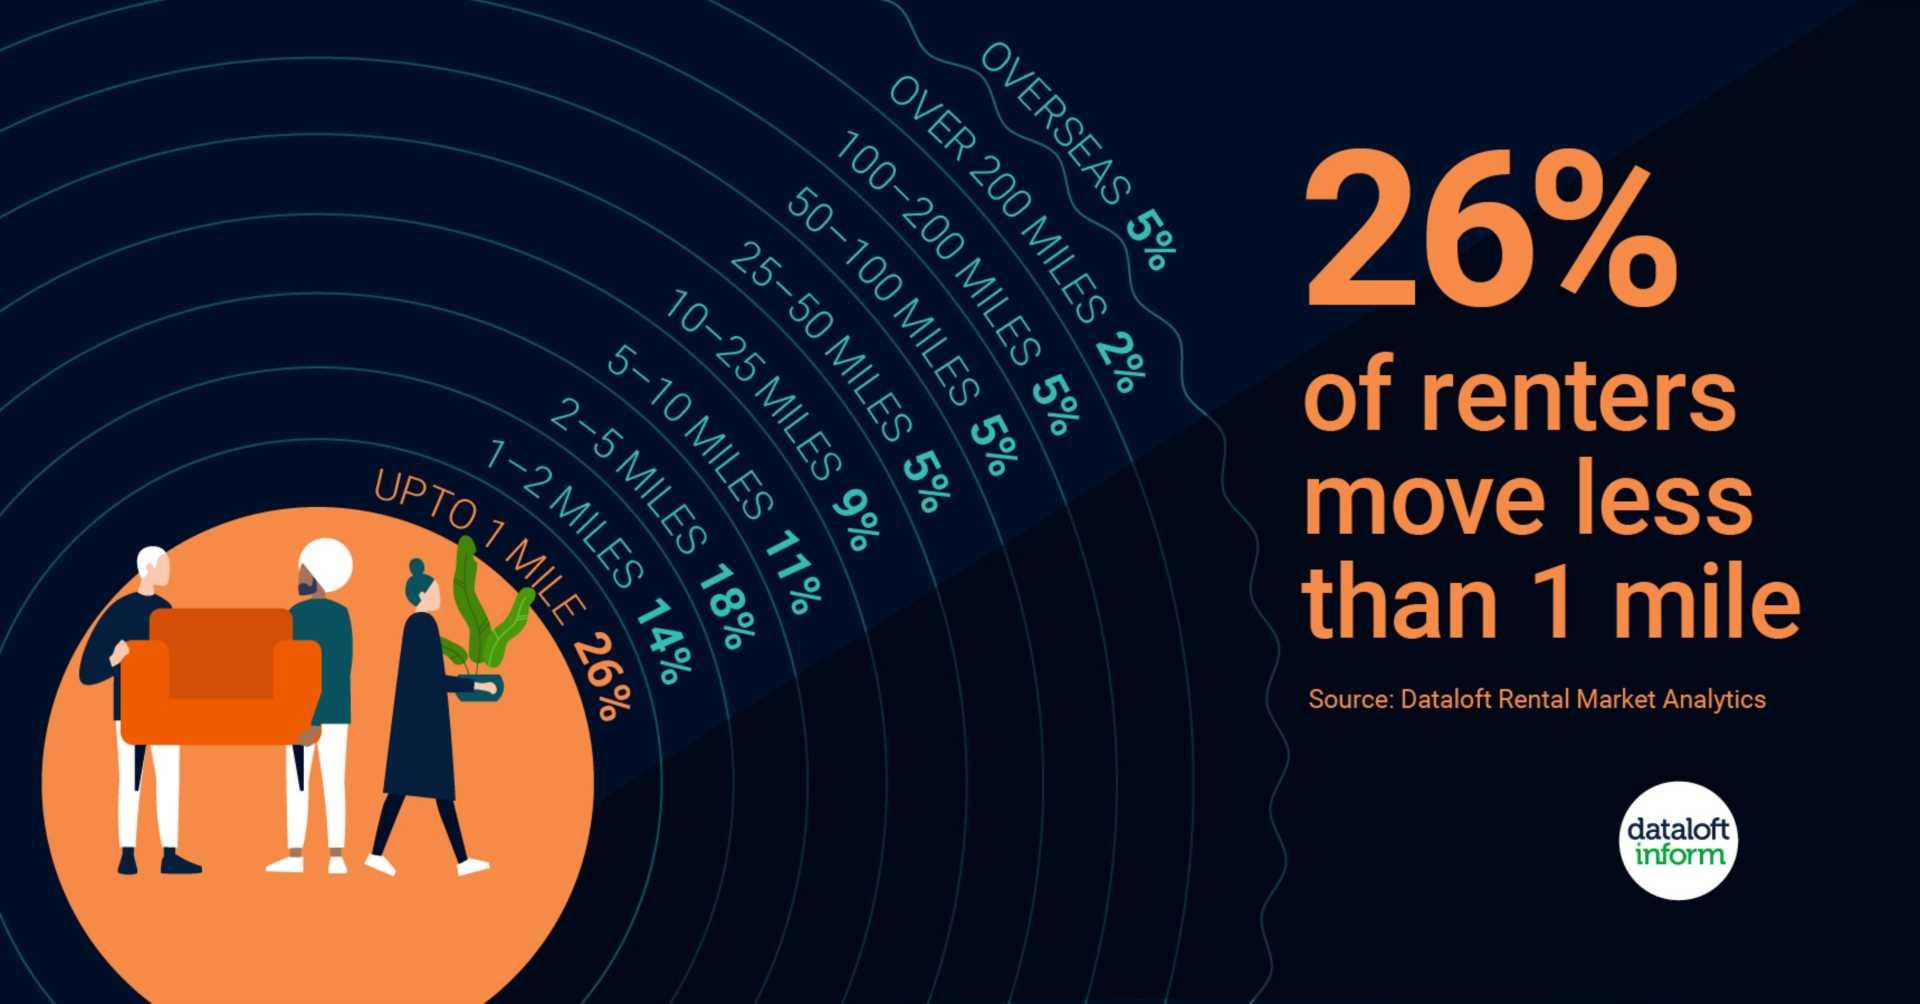 Where do renters move?